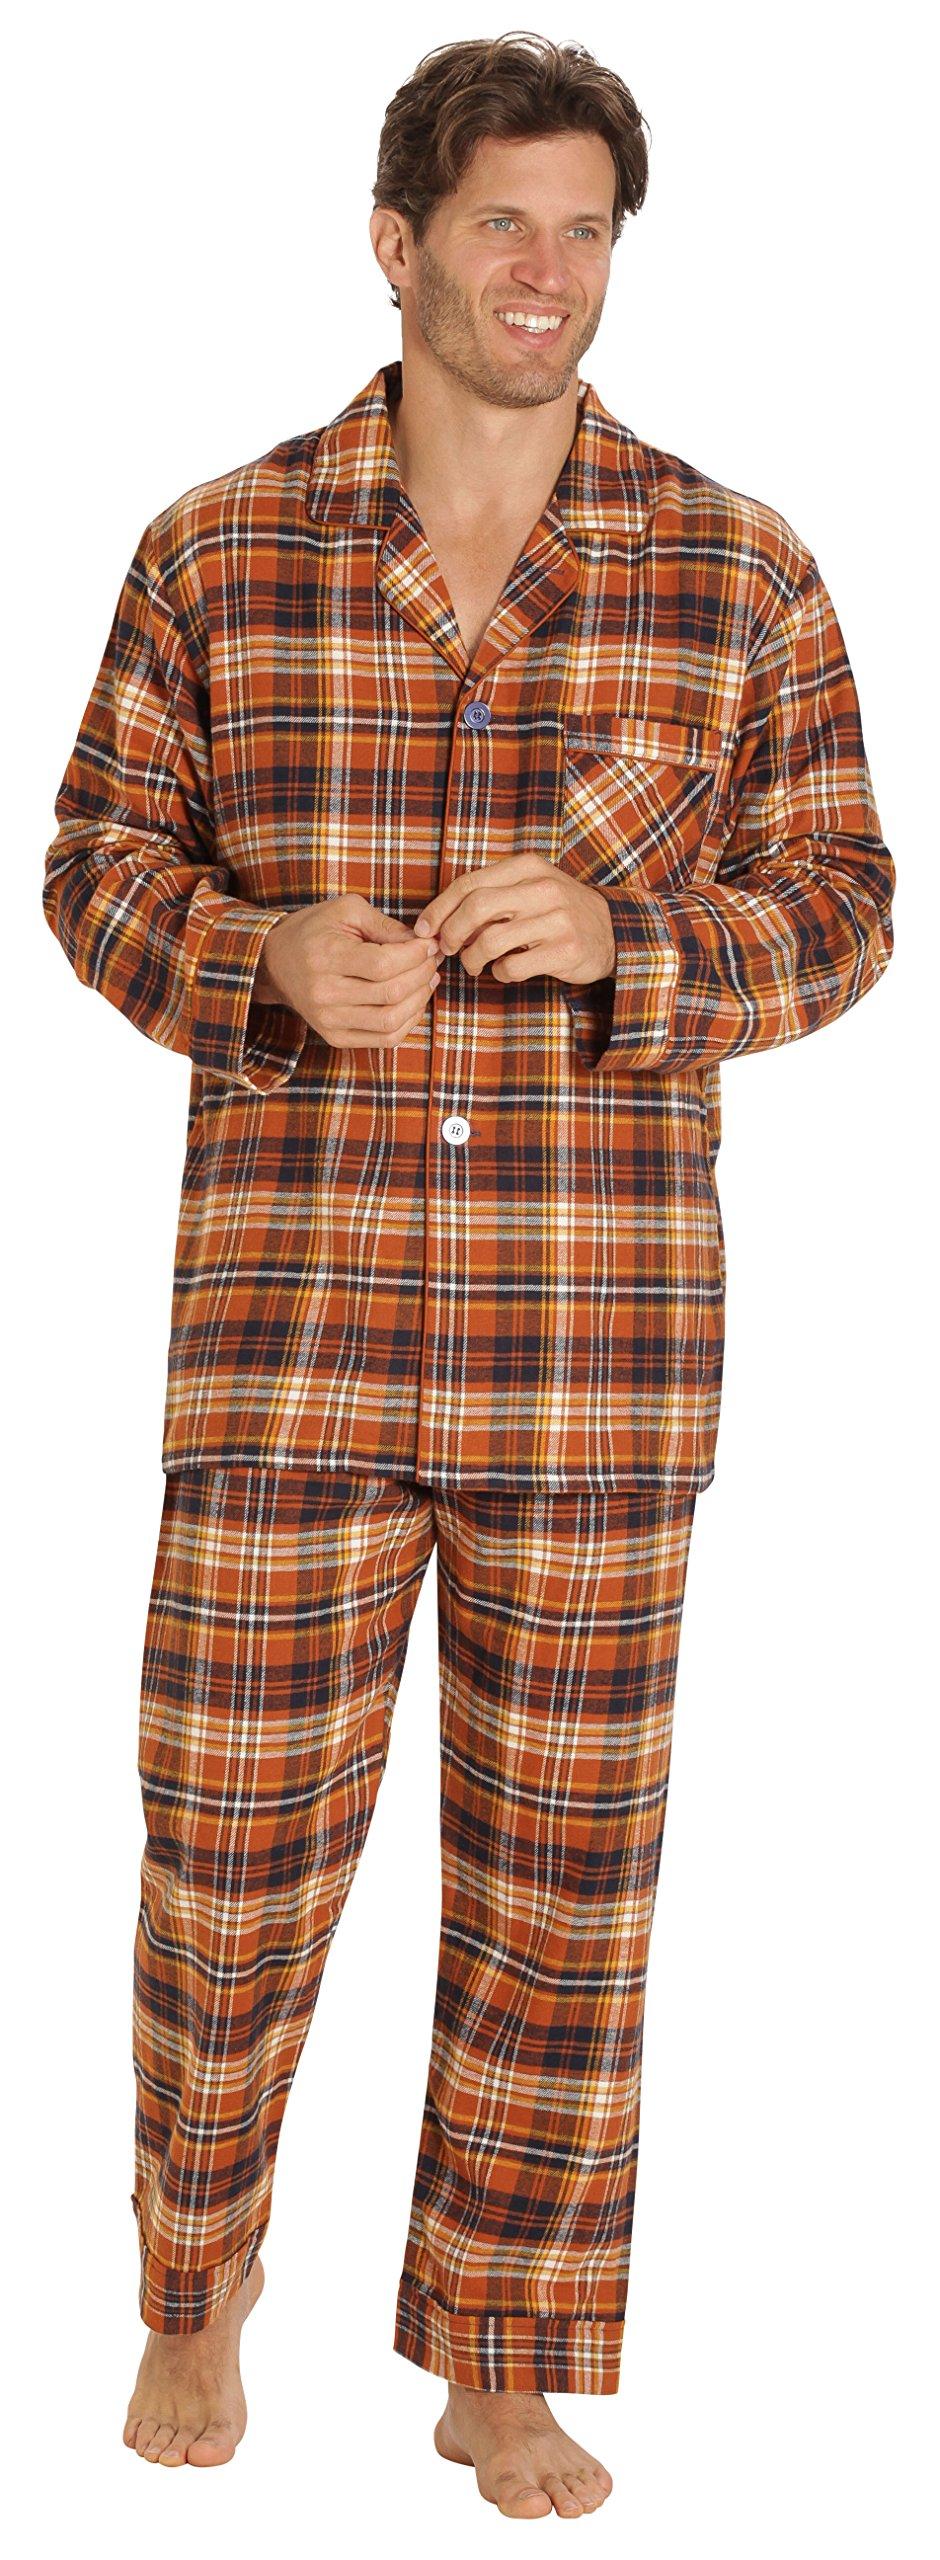 EVERDREAM Sleepwear Mens Flannel Pajamas, Long 100% Cotton Pj Set, Size Small Brown Rust